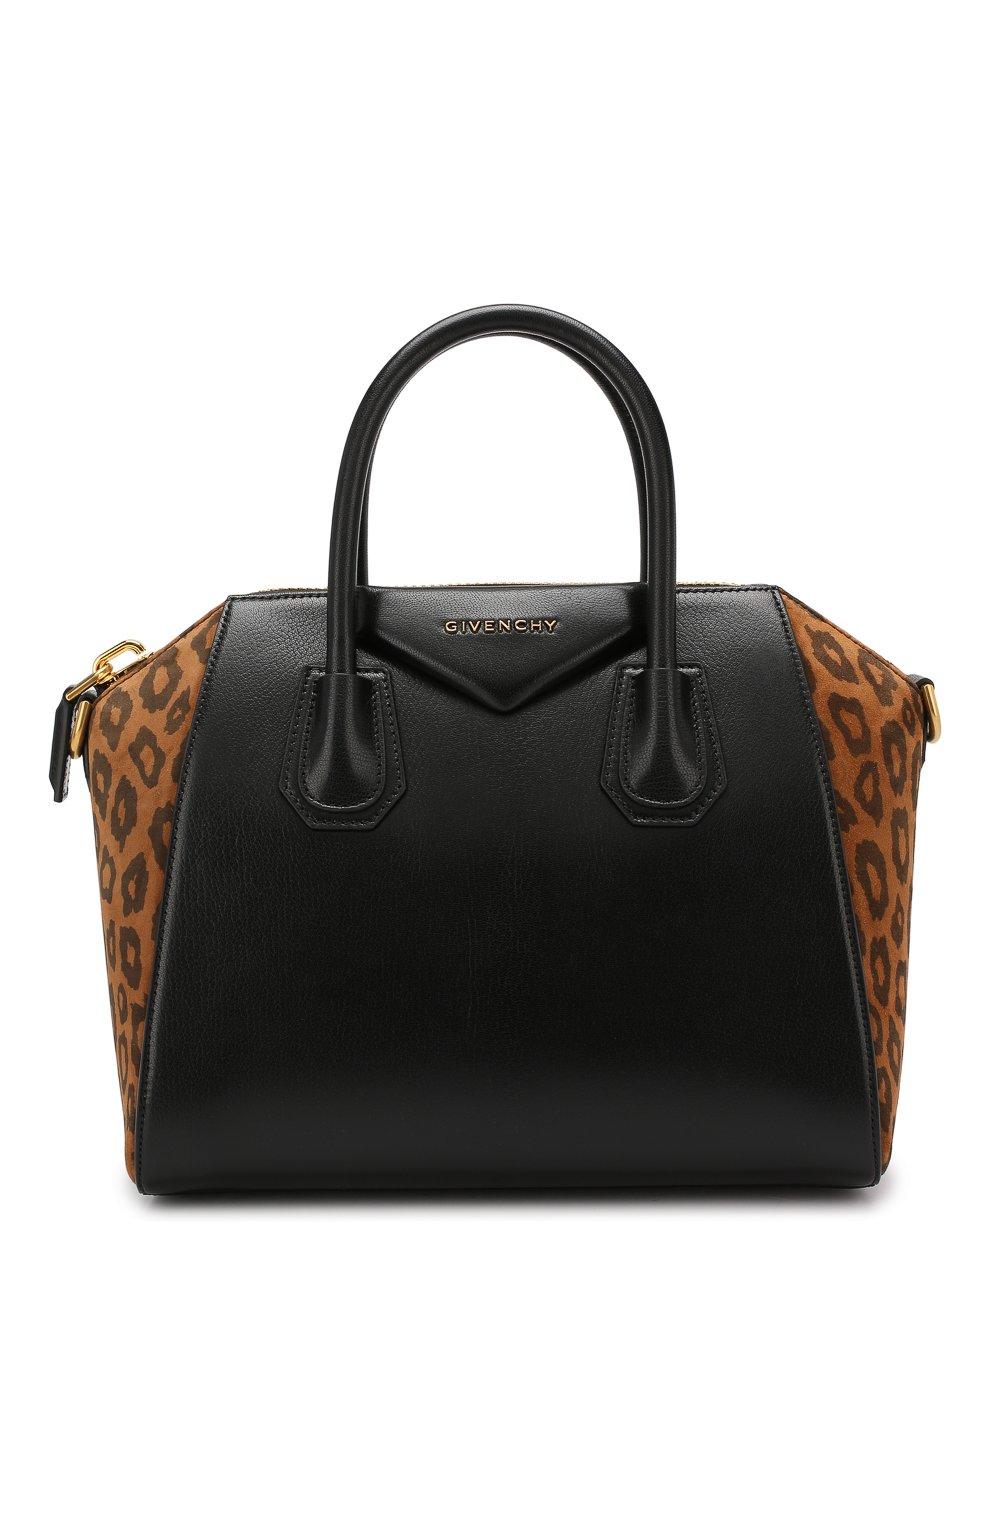 Сумка Antigona small Givenchy черная цвета | Фото №1